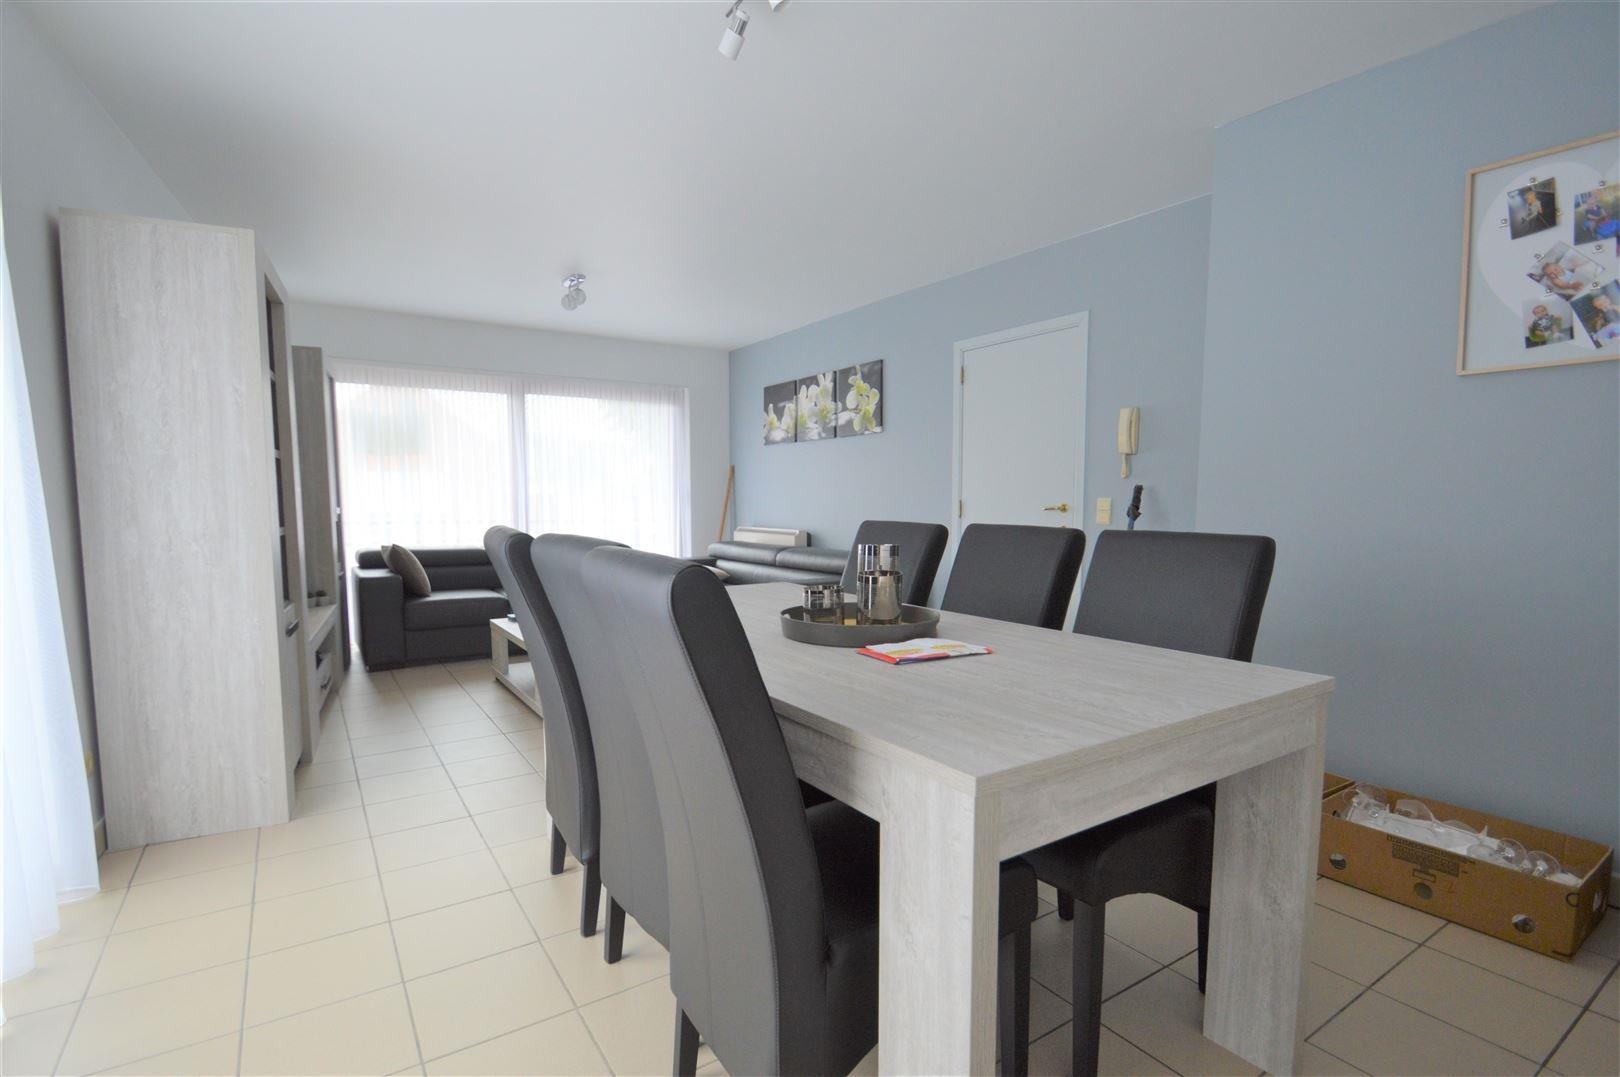 Foto 3 : Appartement te 9280 LEBBEKE (België) - Prijs € 650